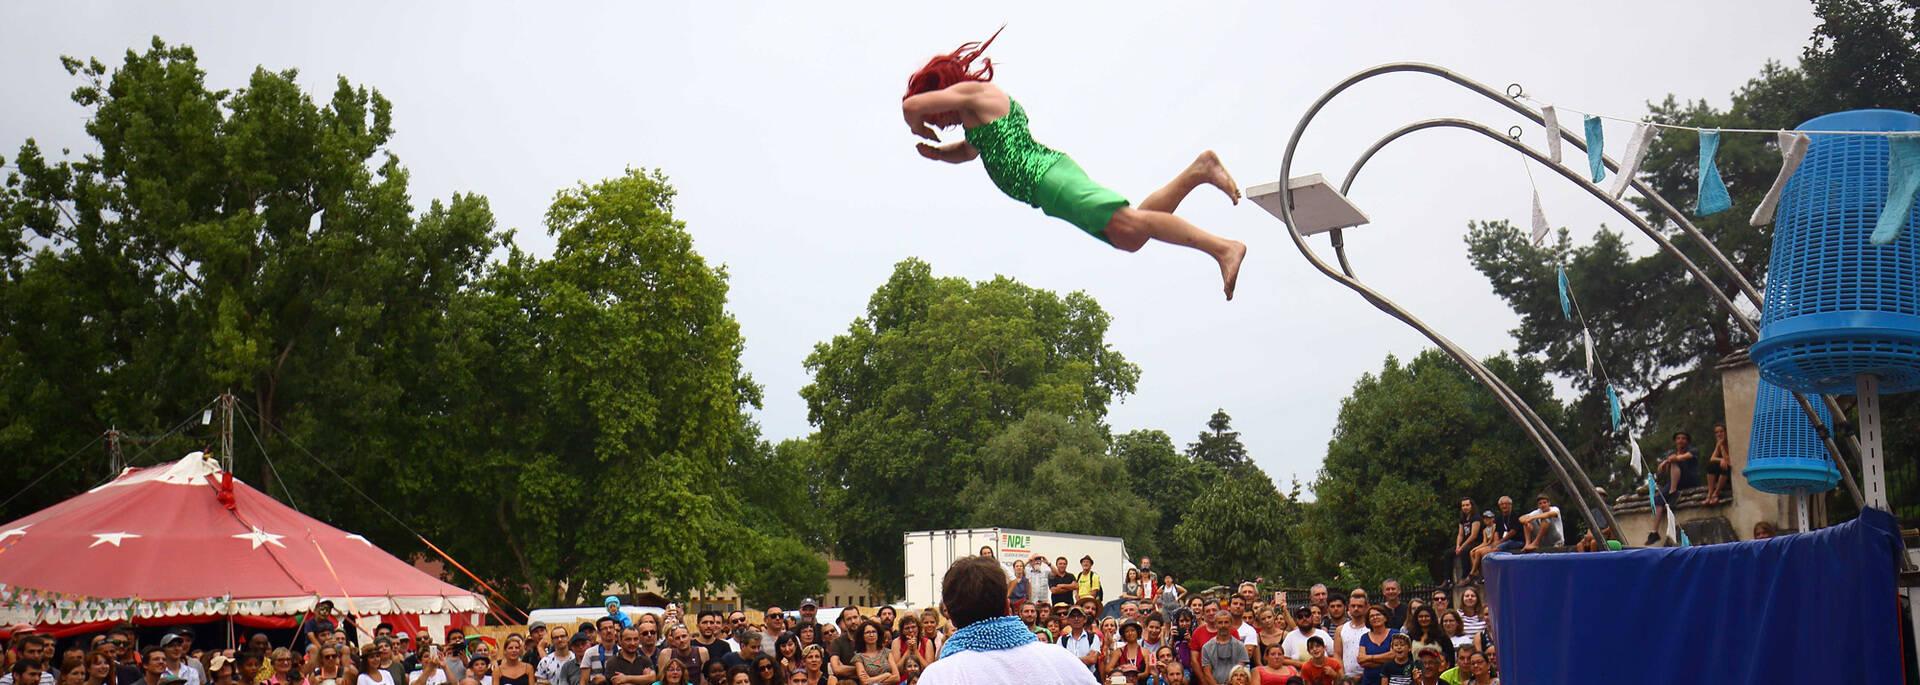 Festival Chalon dans la Rue